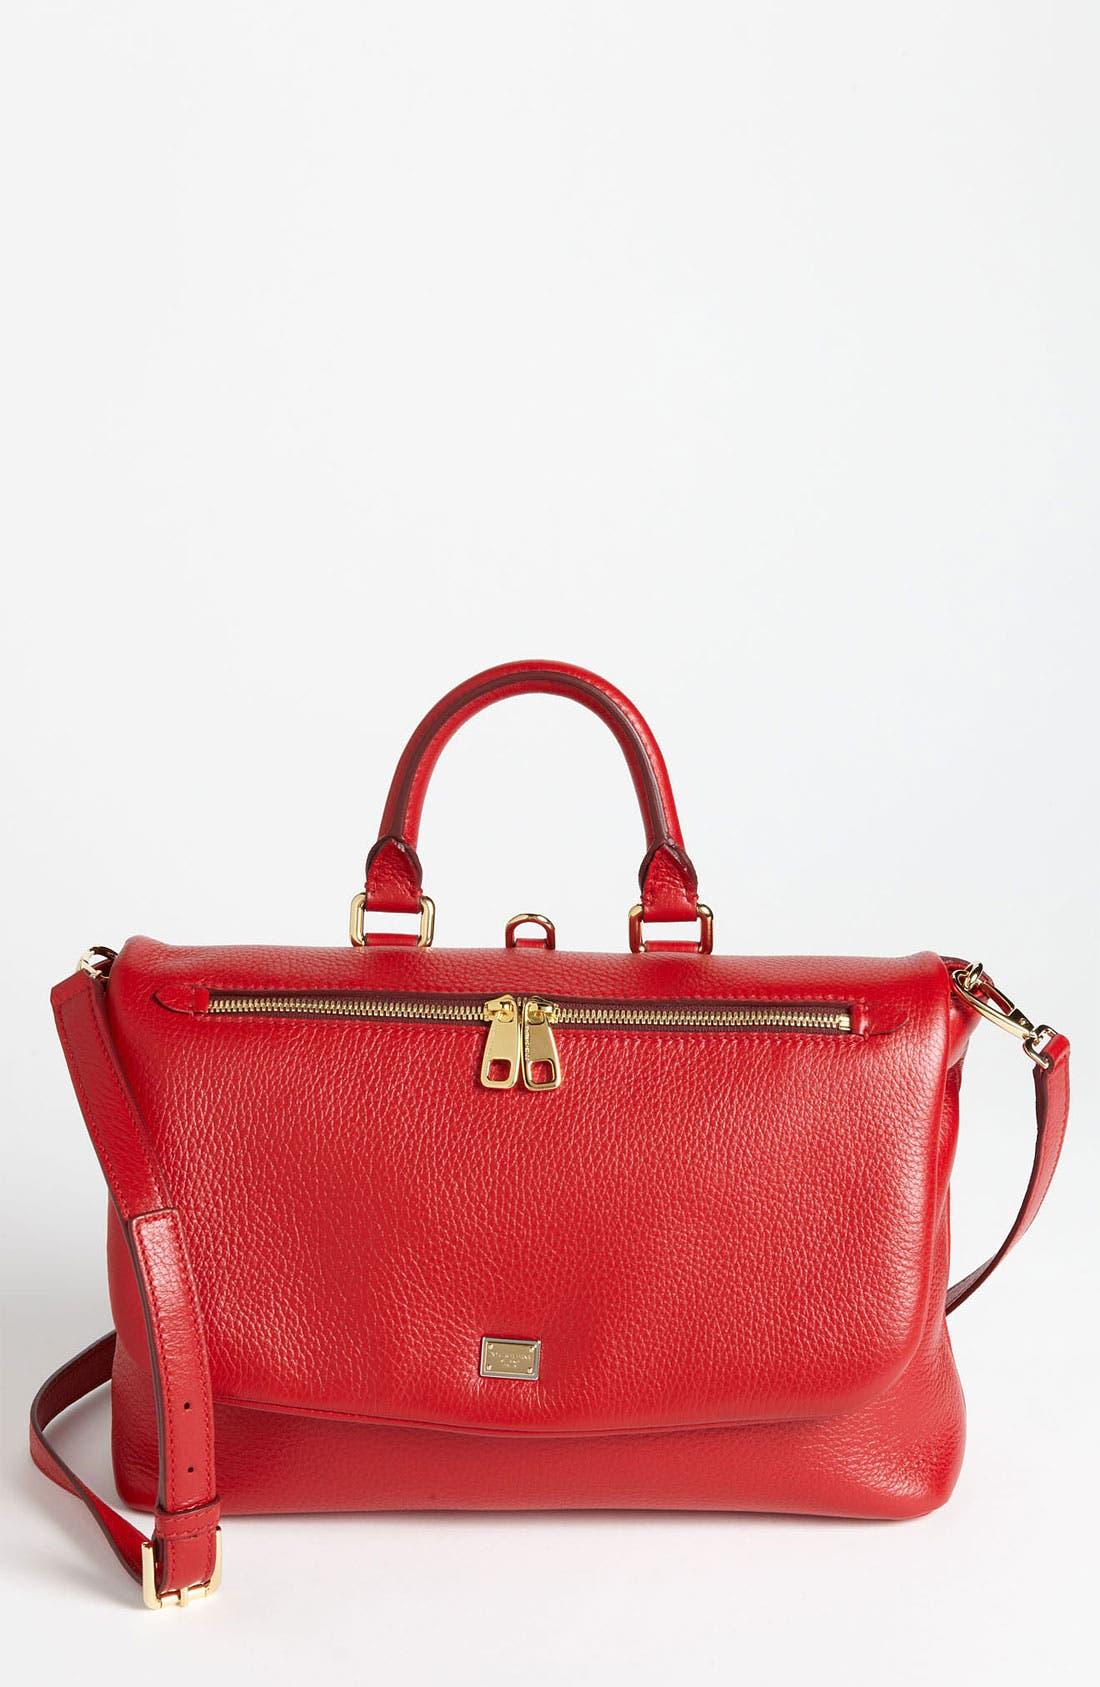 Main Image - Dolce&Gabbana 'Miss Emma' Leather Satchel